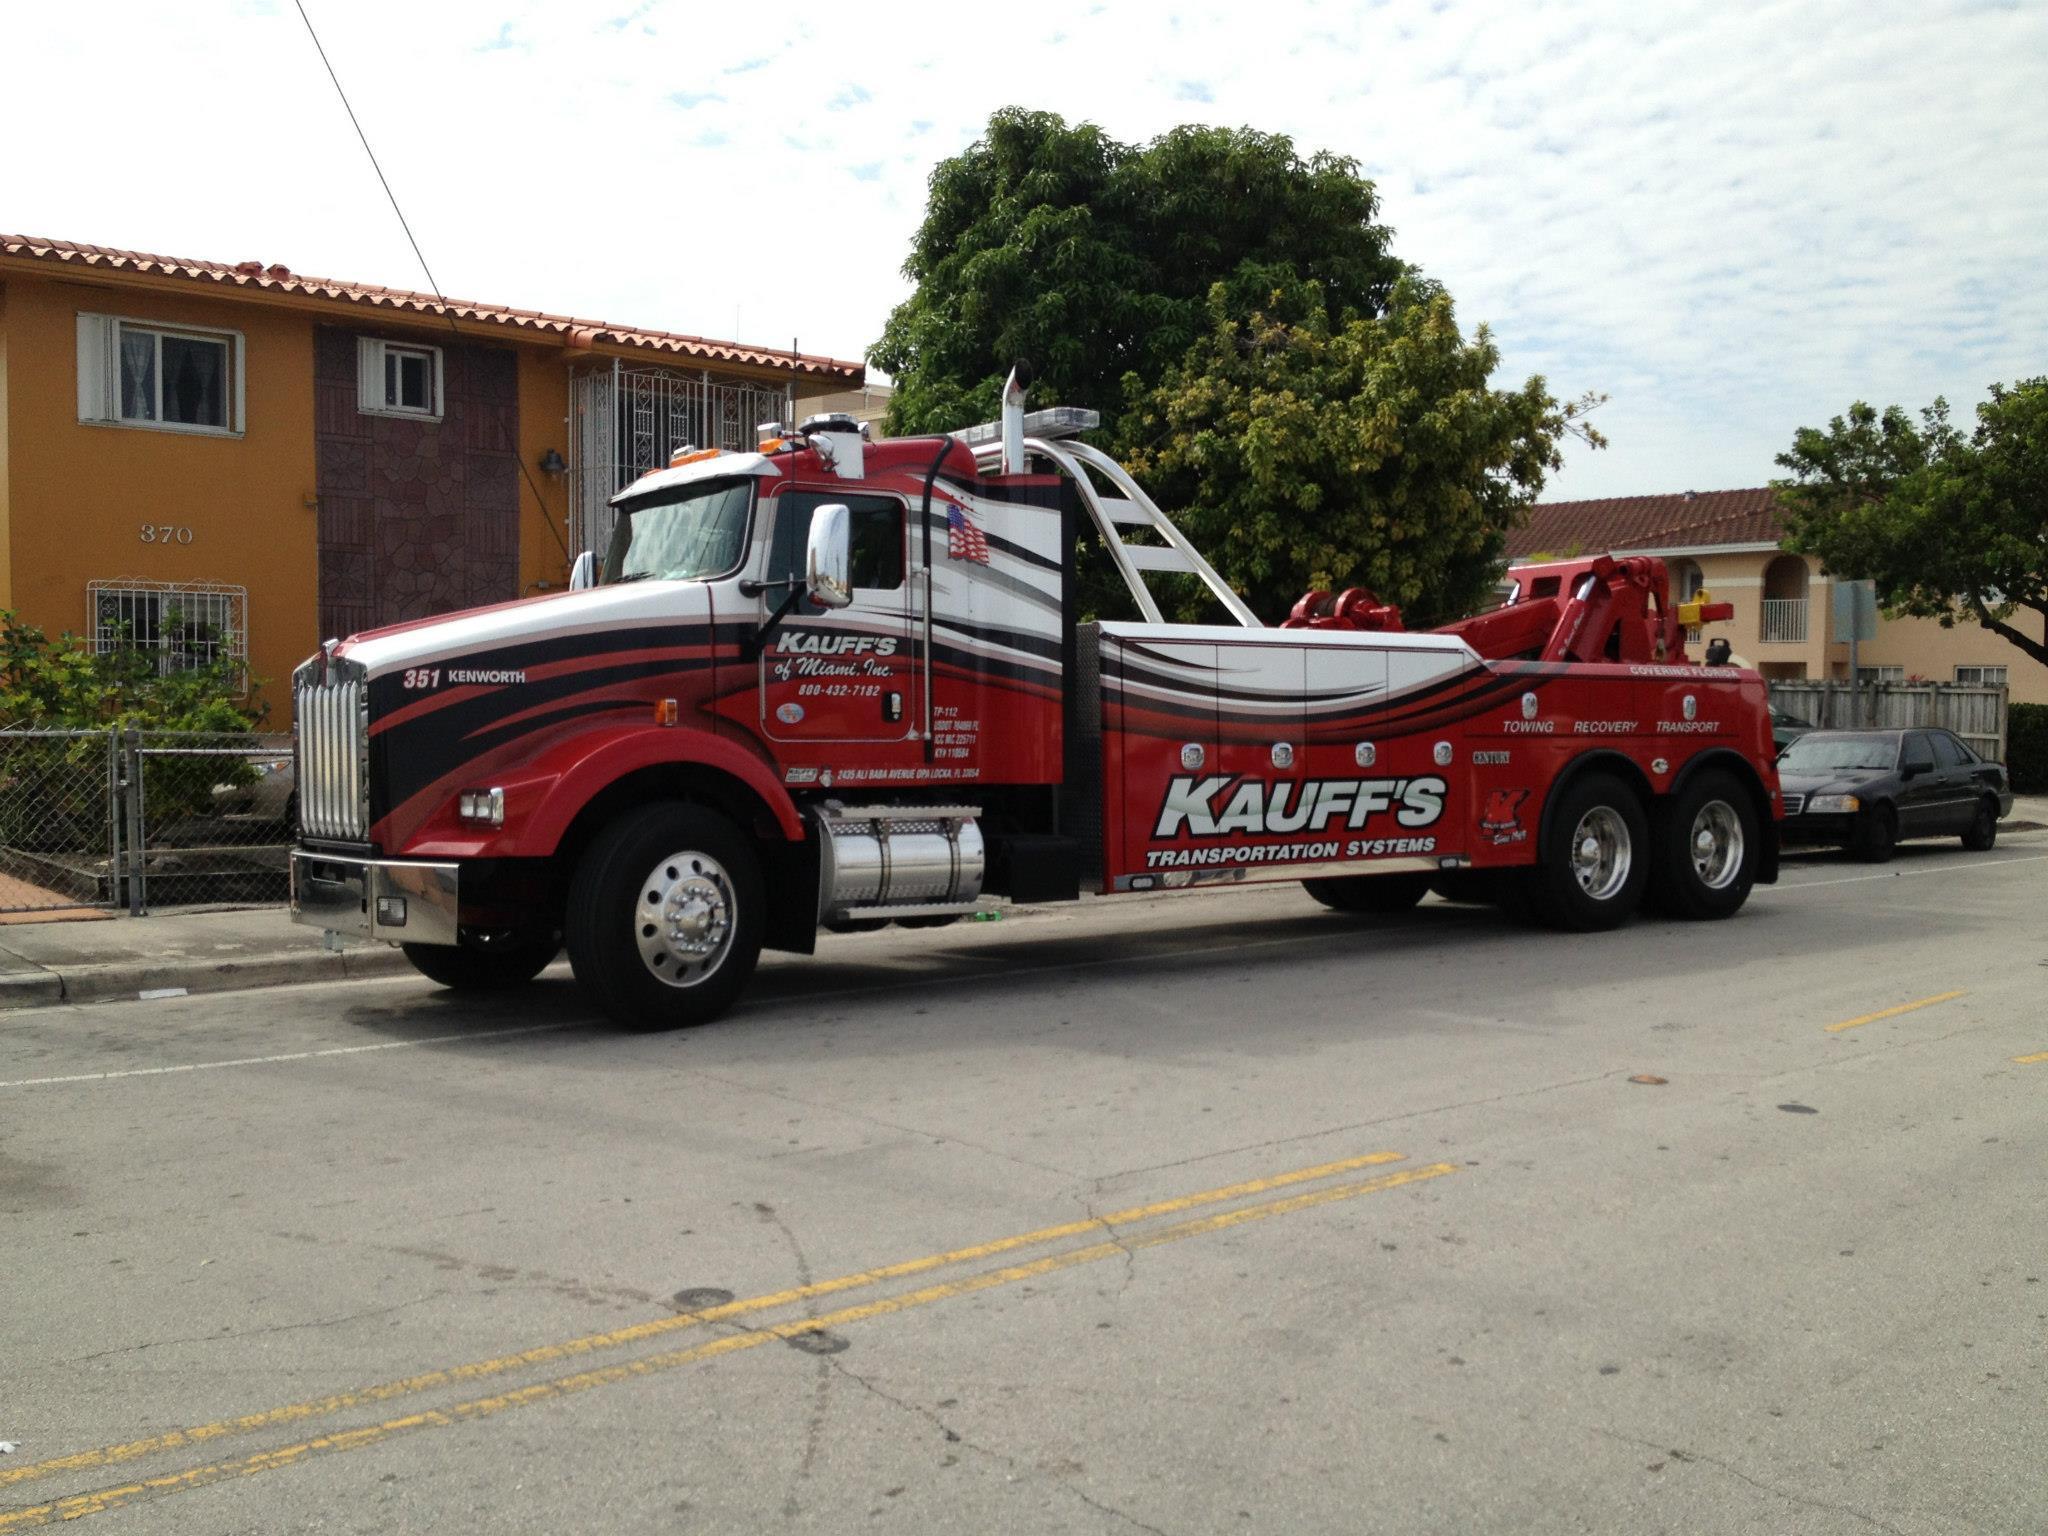 Kauff's Transportation Systems image 2